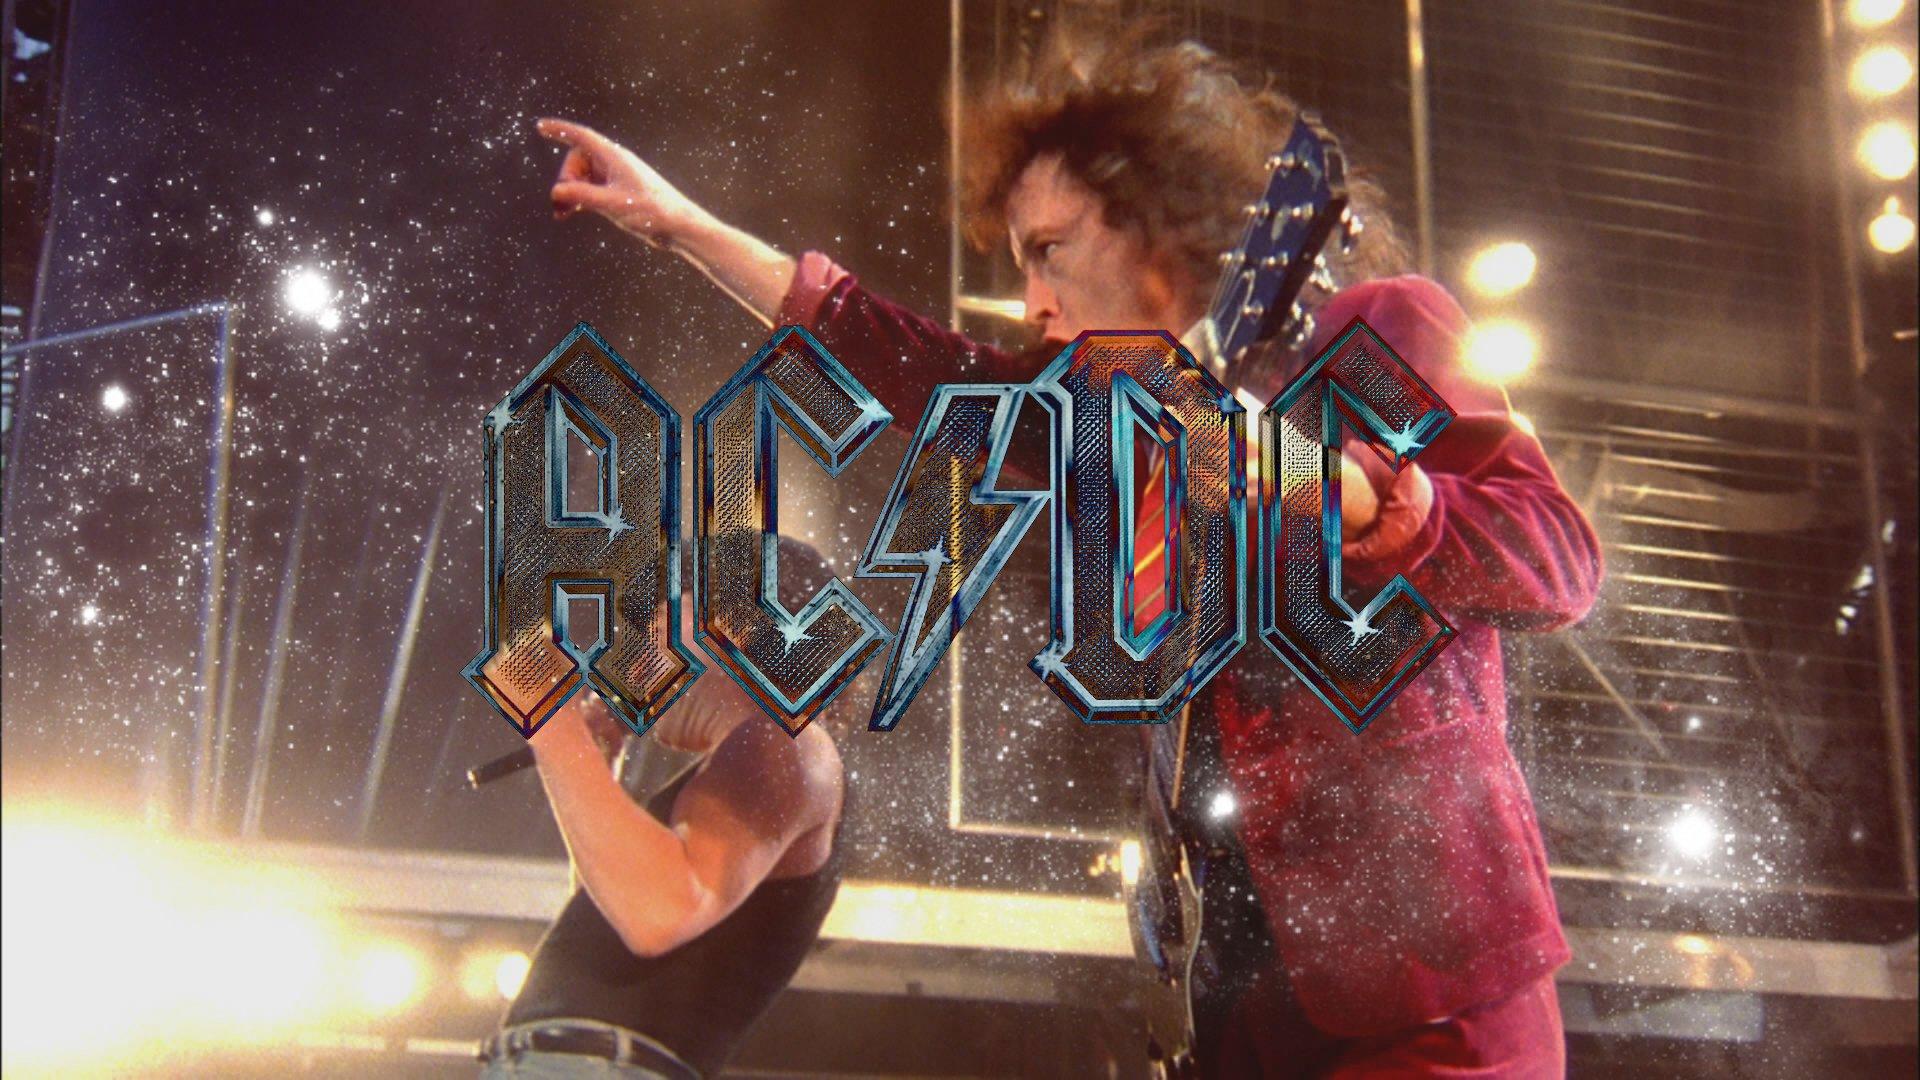 Fondos De Escritorio Hd Dc: AC/DC Full HD Wallpaper And Background Image